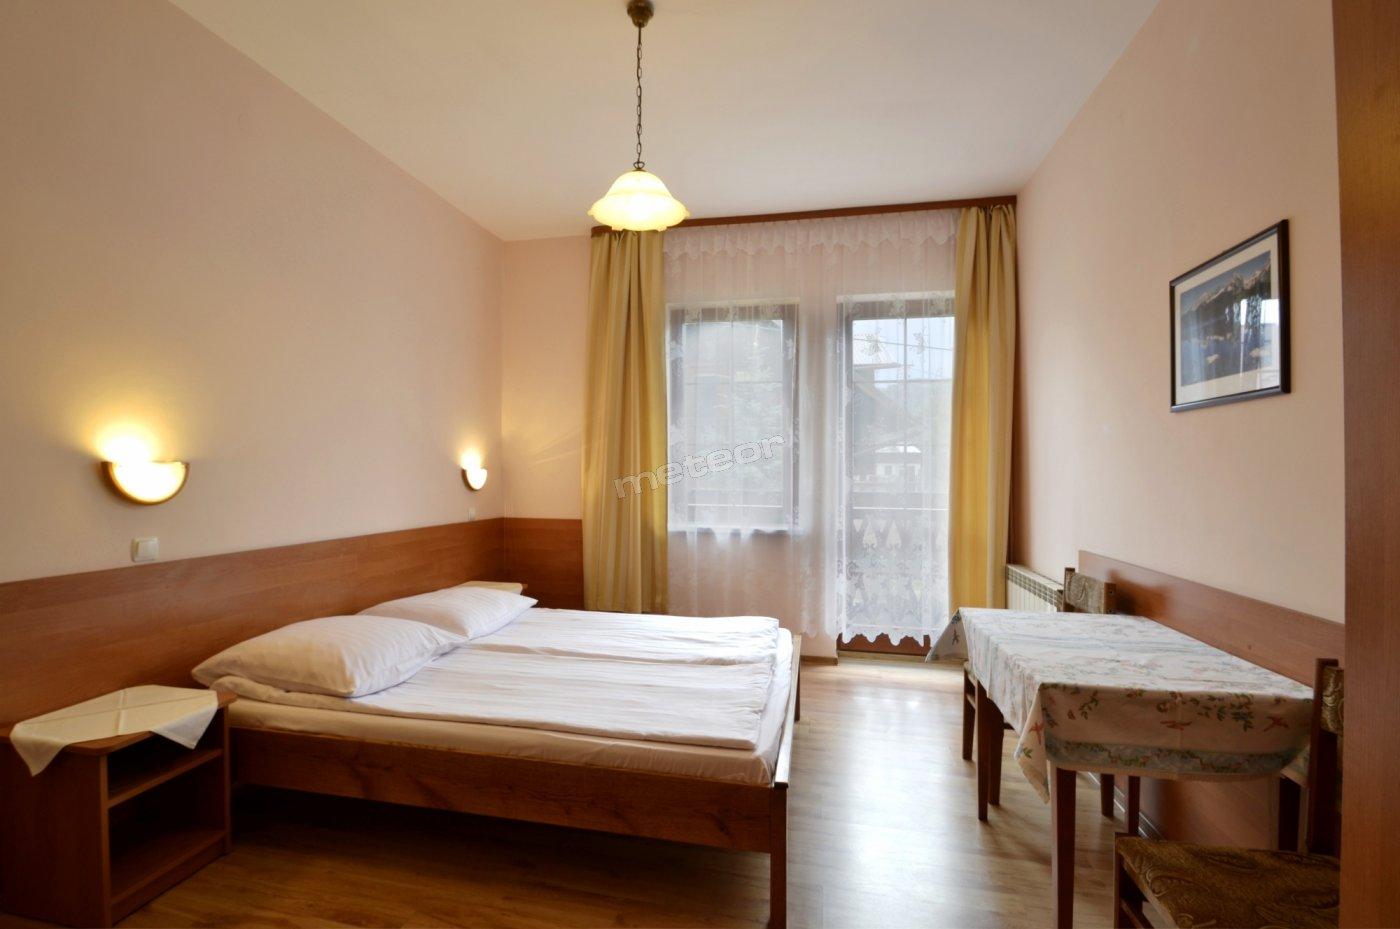 Willa Szarotka Bed & Breakfast